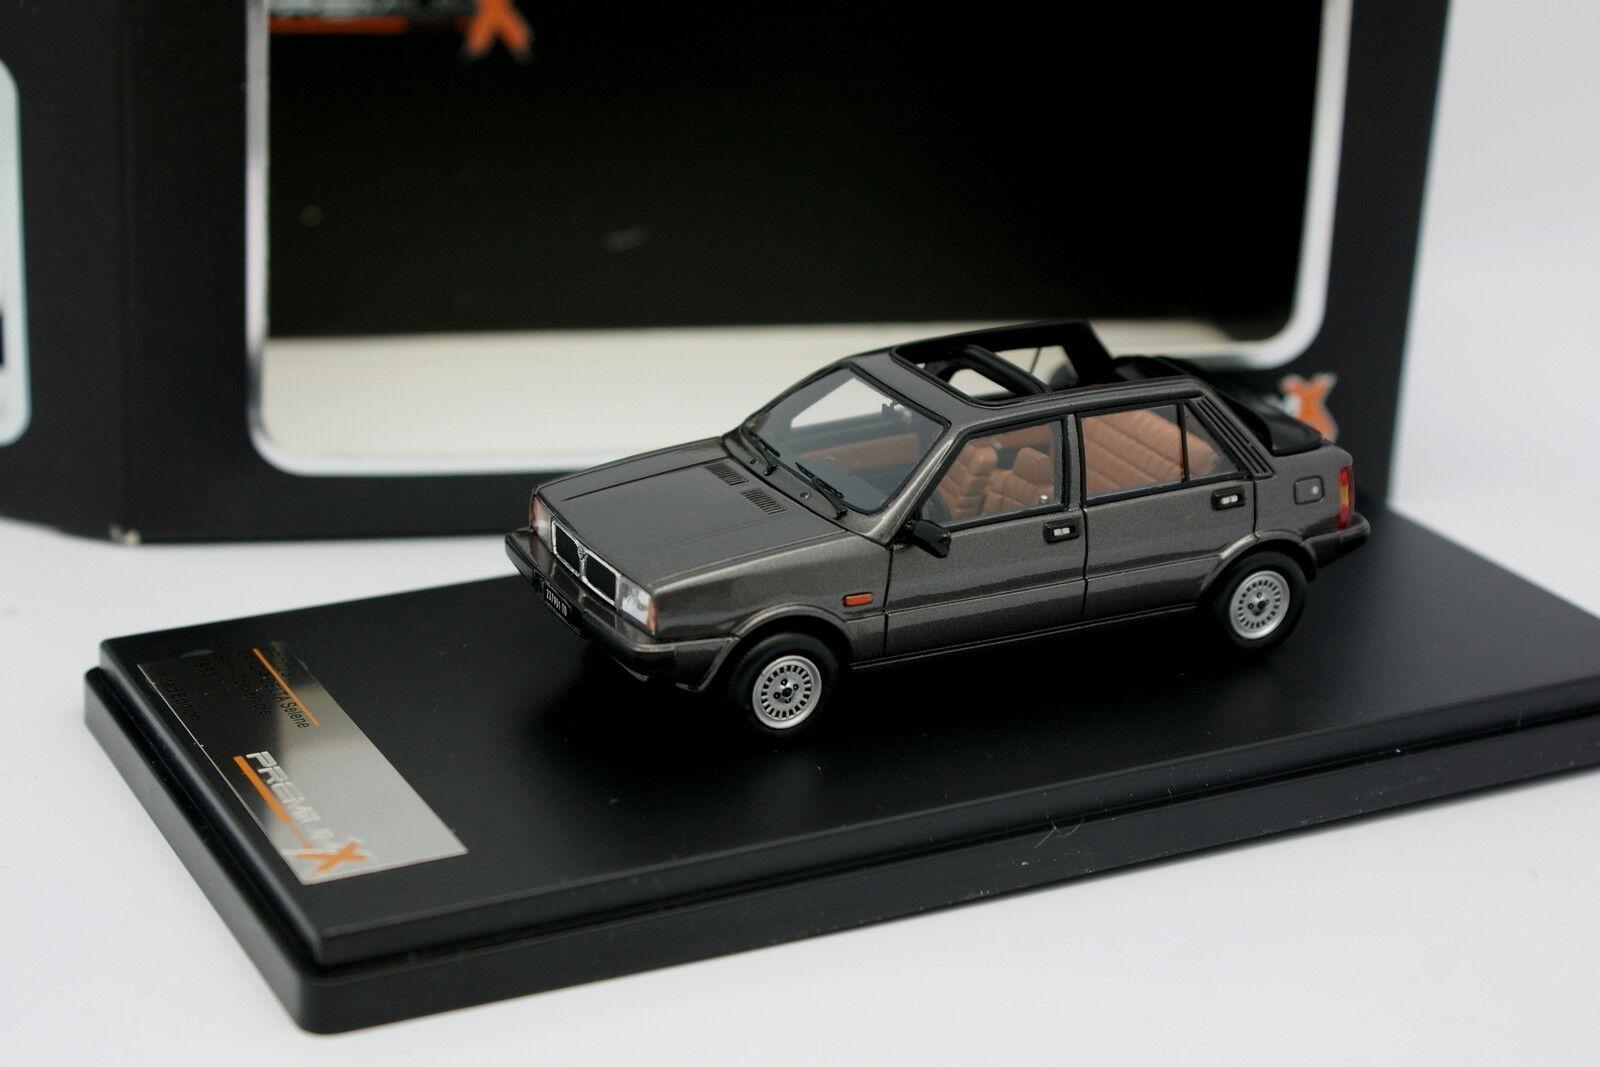 Premium X 1 43 - Lancia Delta Selene Congreenible